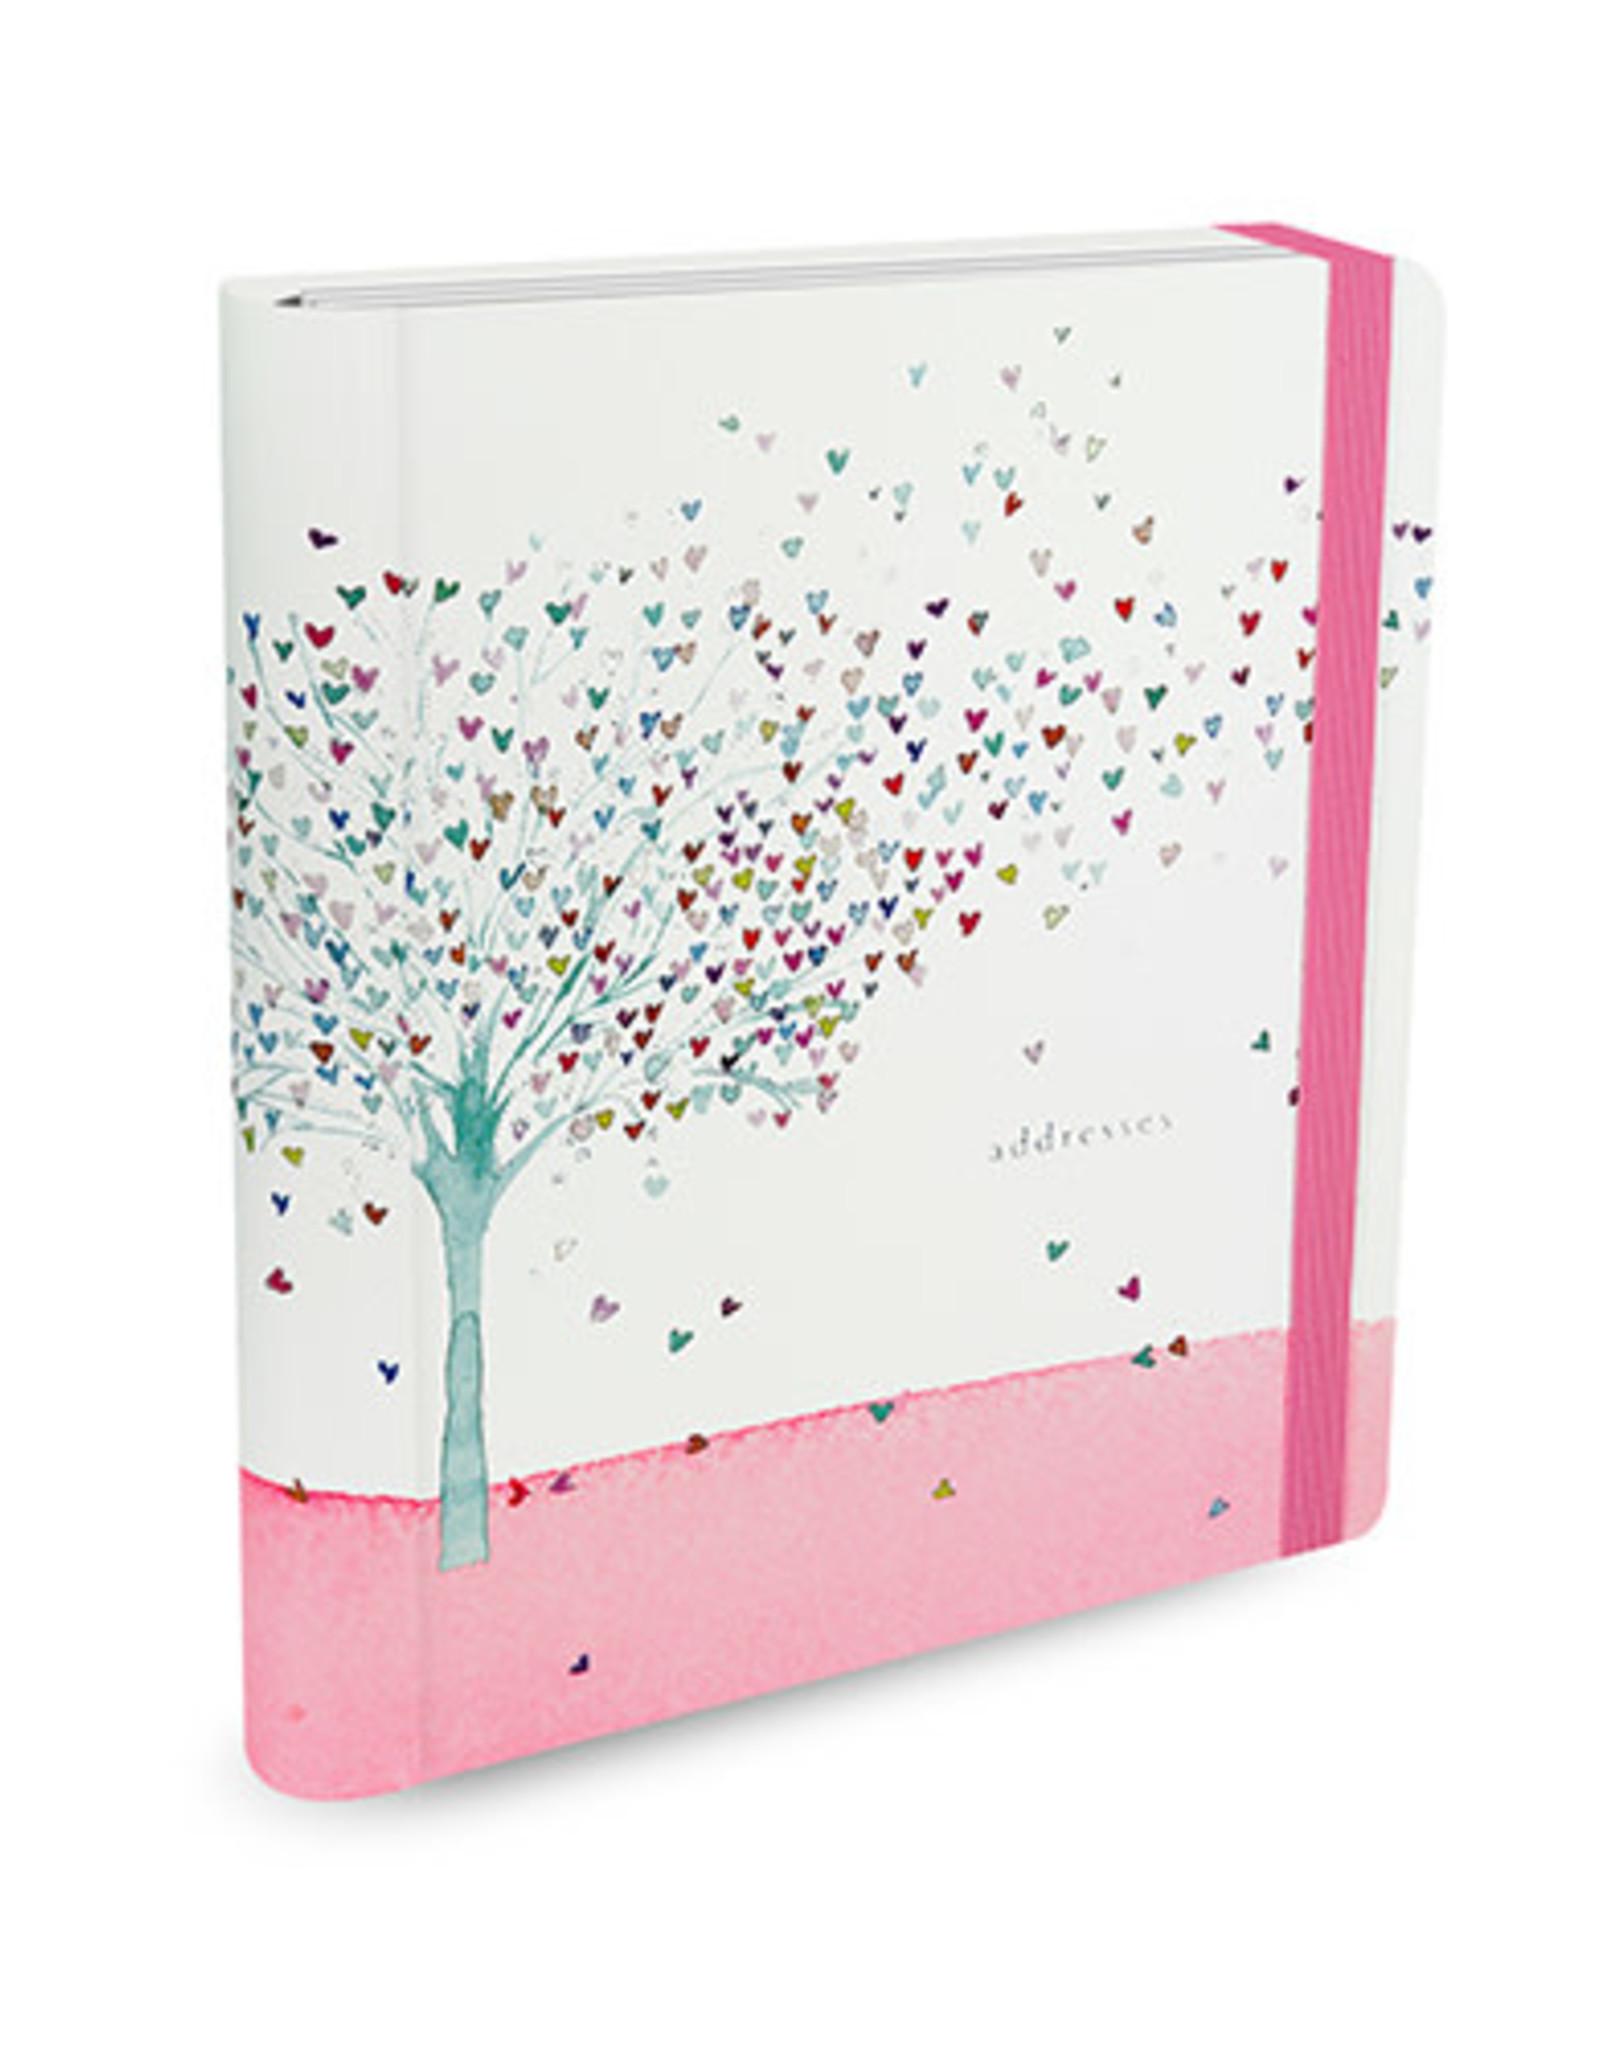 Adresboek A5 Peter Pauper Tree of hearts - Comello